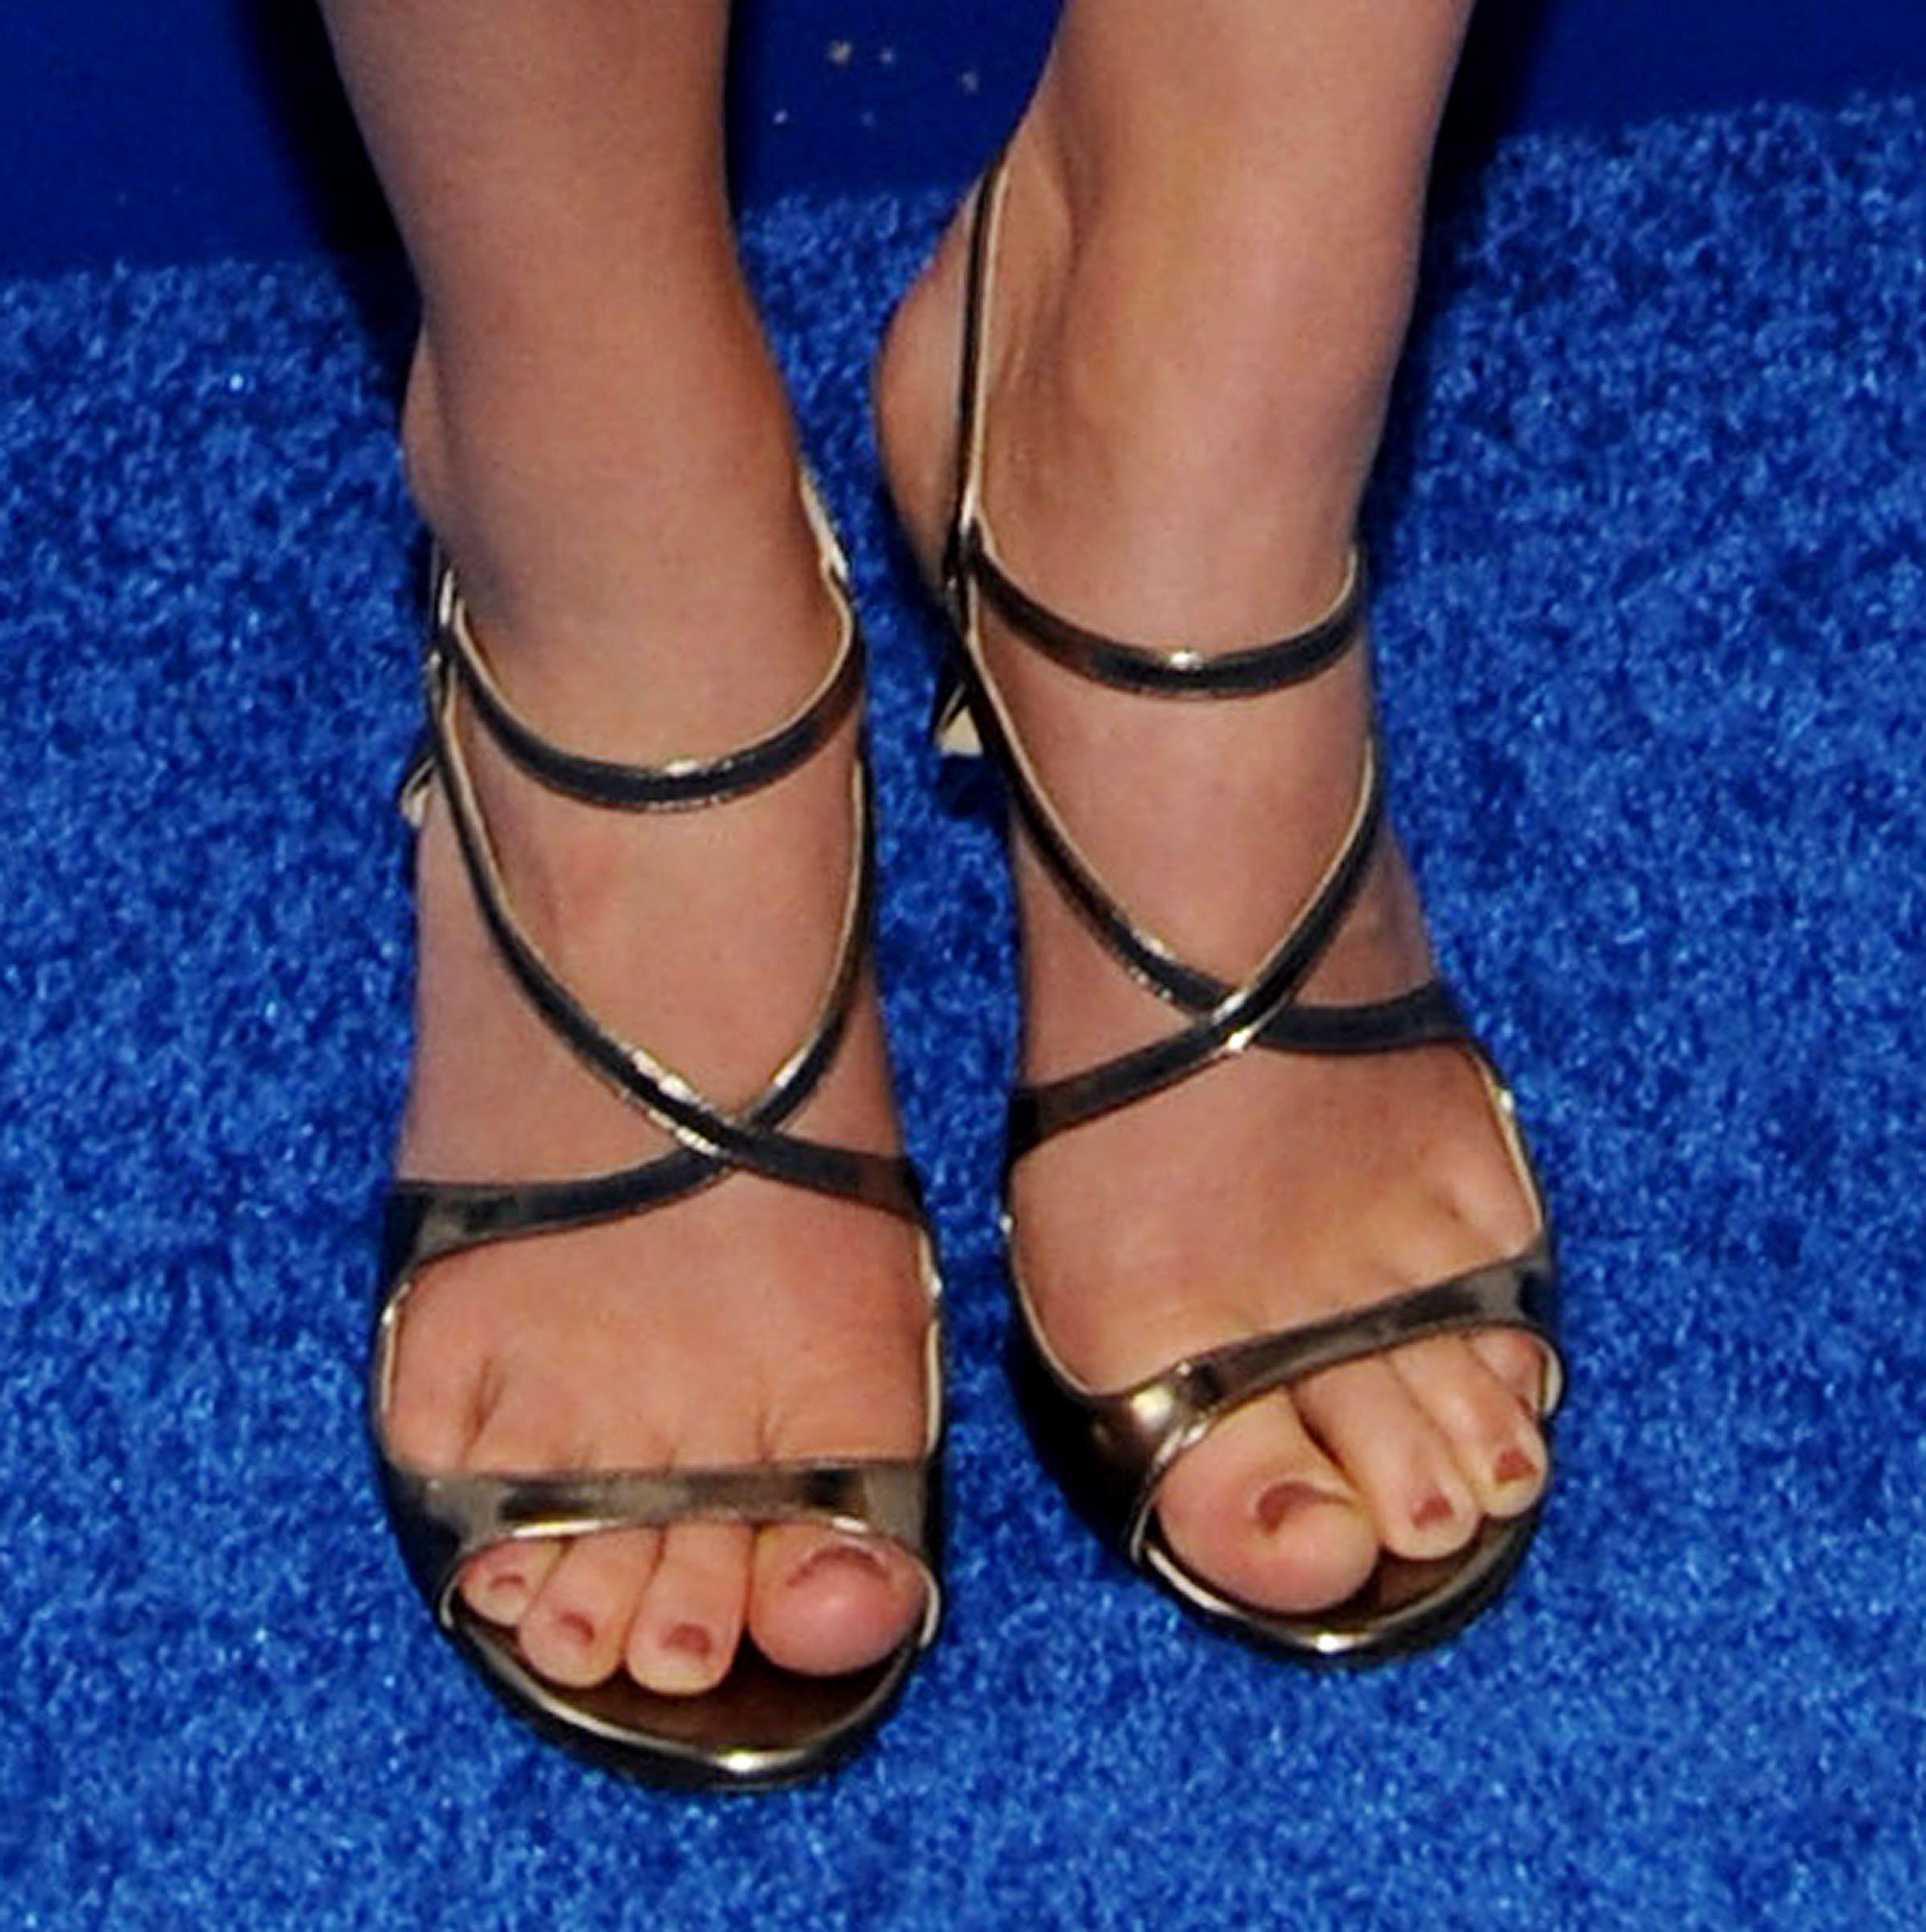 AnnaSophia-Robb-Feet-1359727.jpg (2400×2407)   Stopy ...